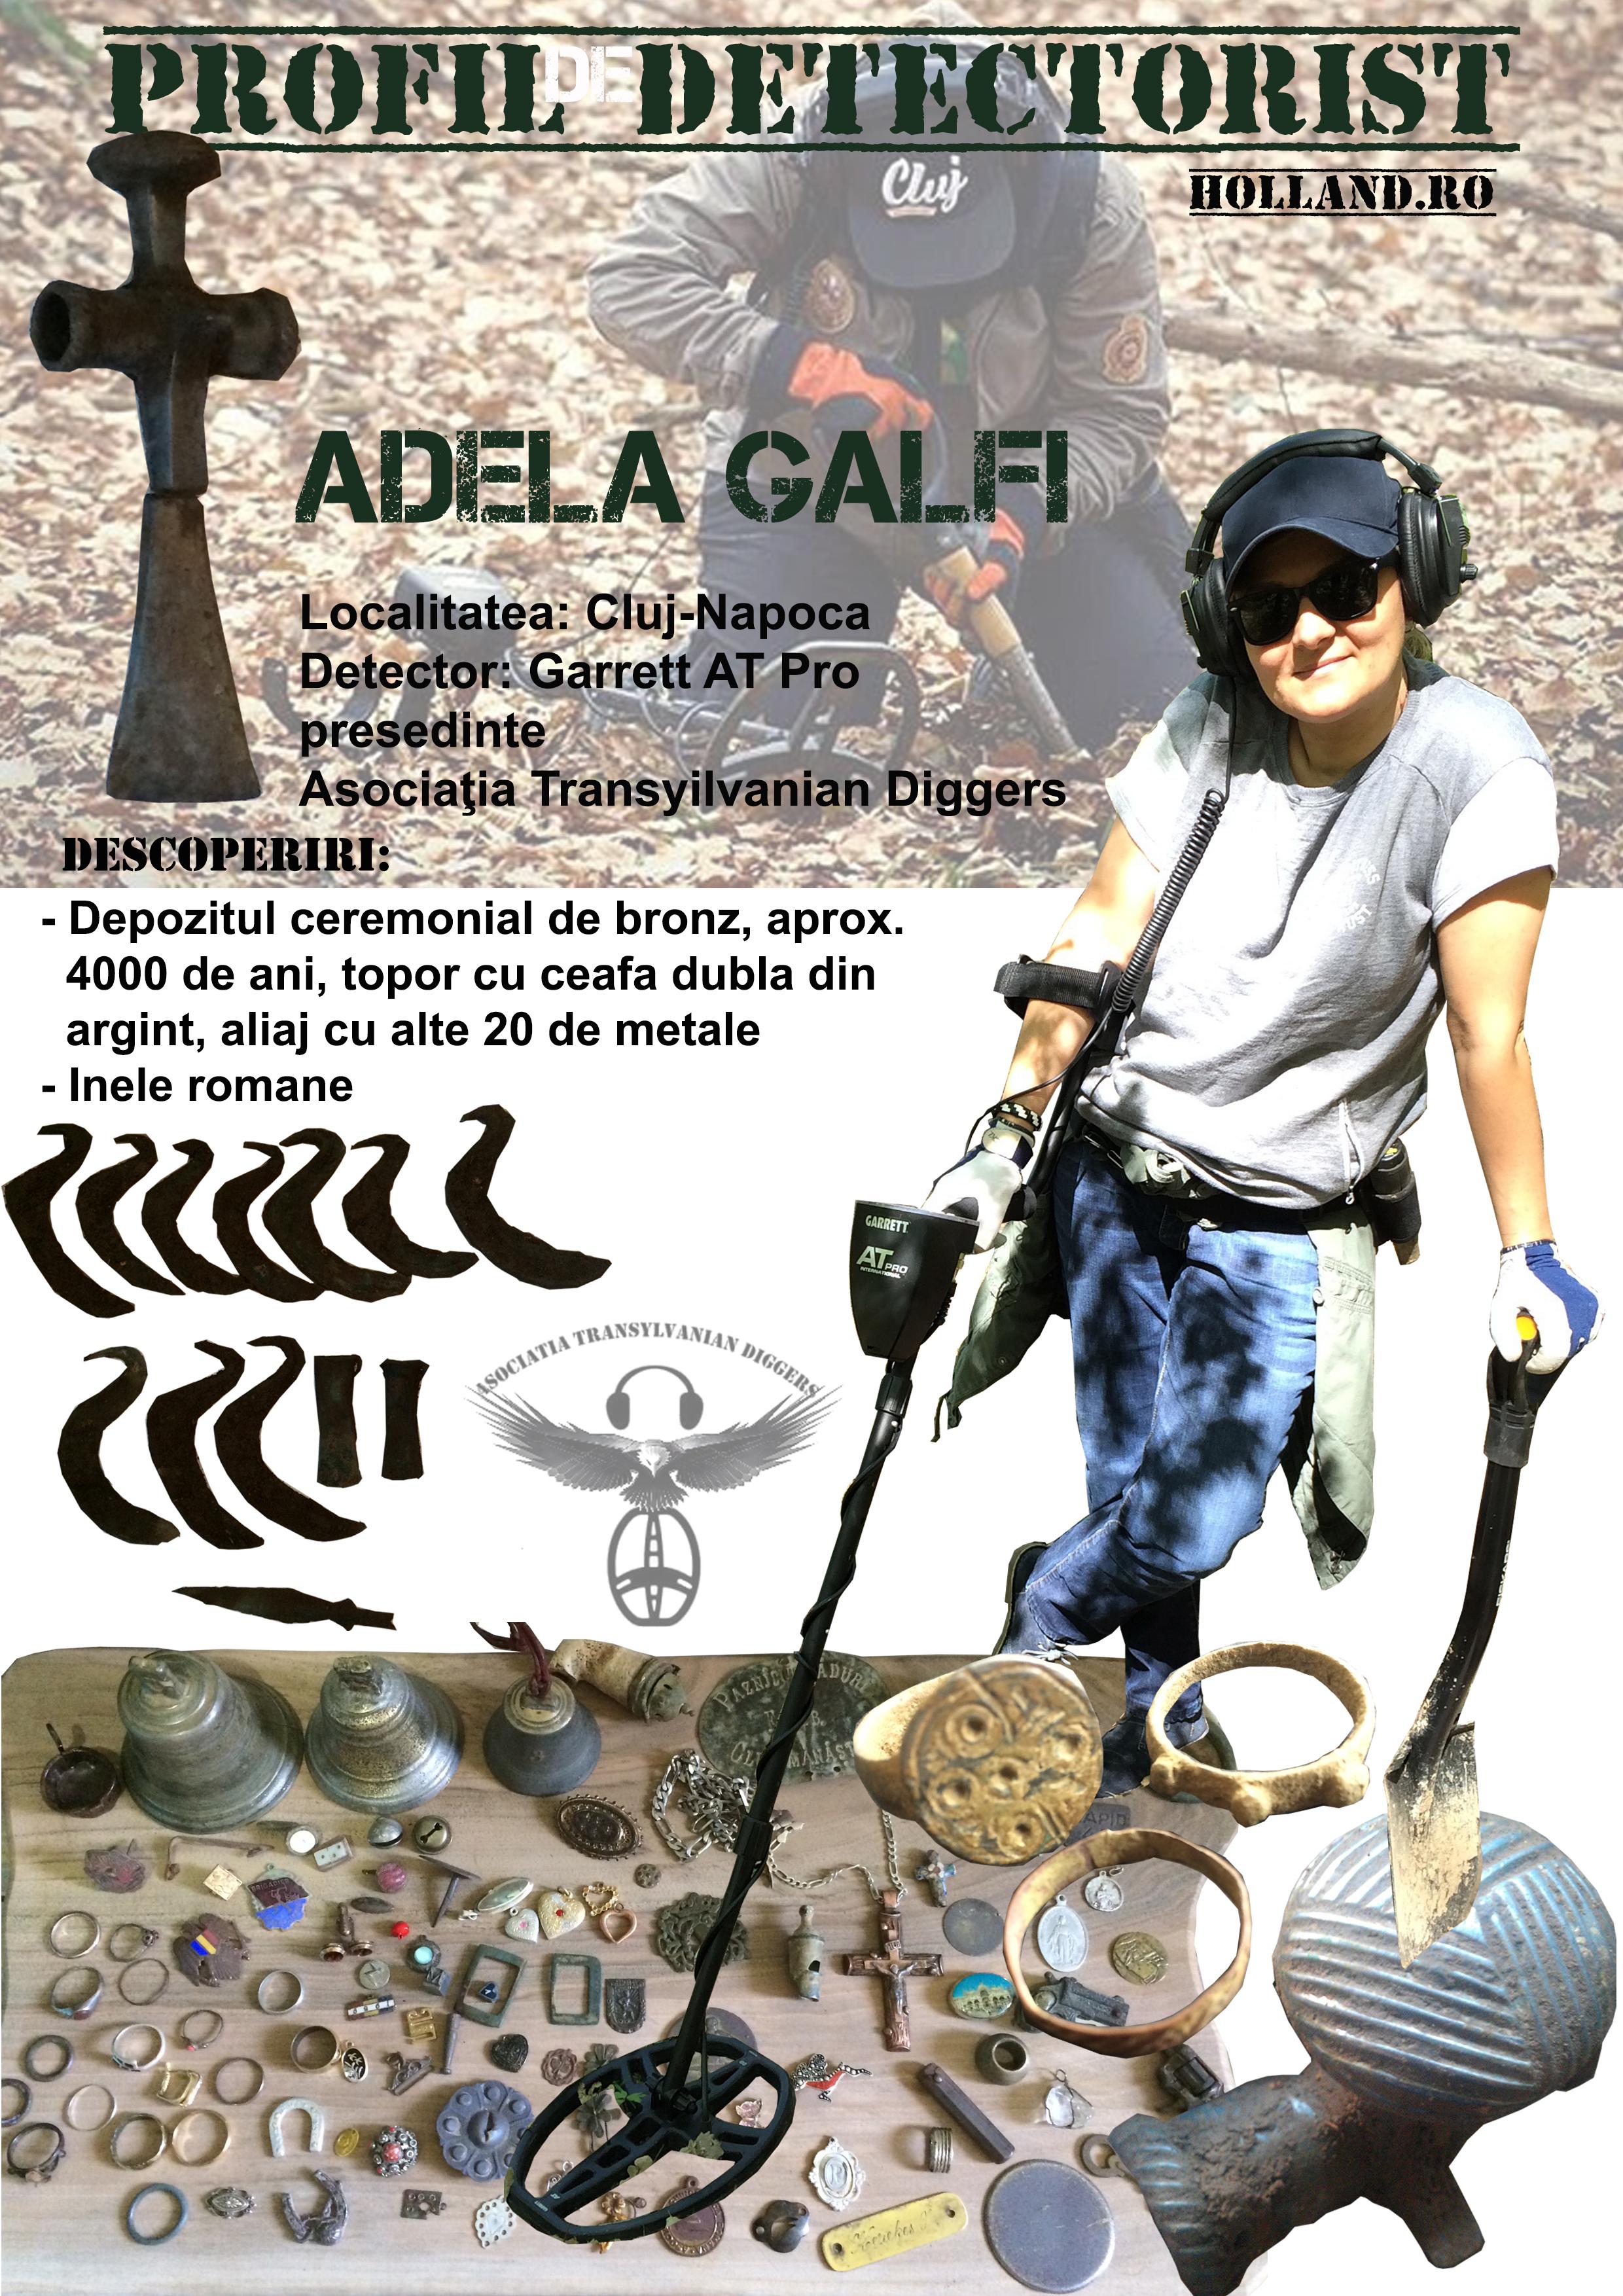 Profil de Detectorist - Adela Galfi